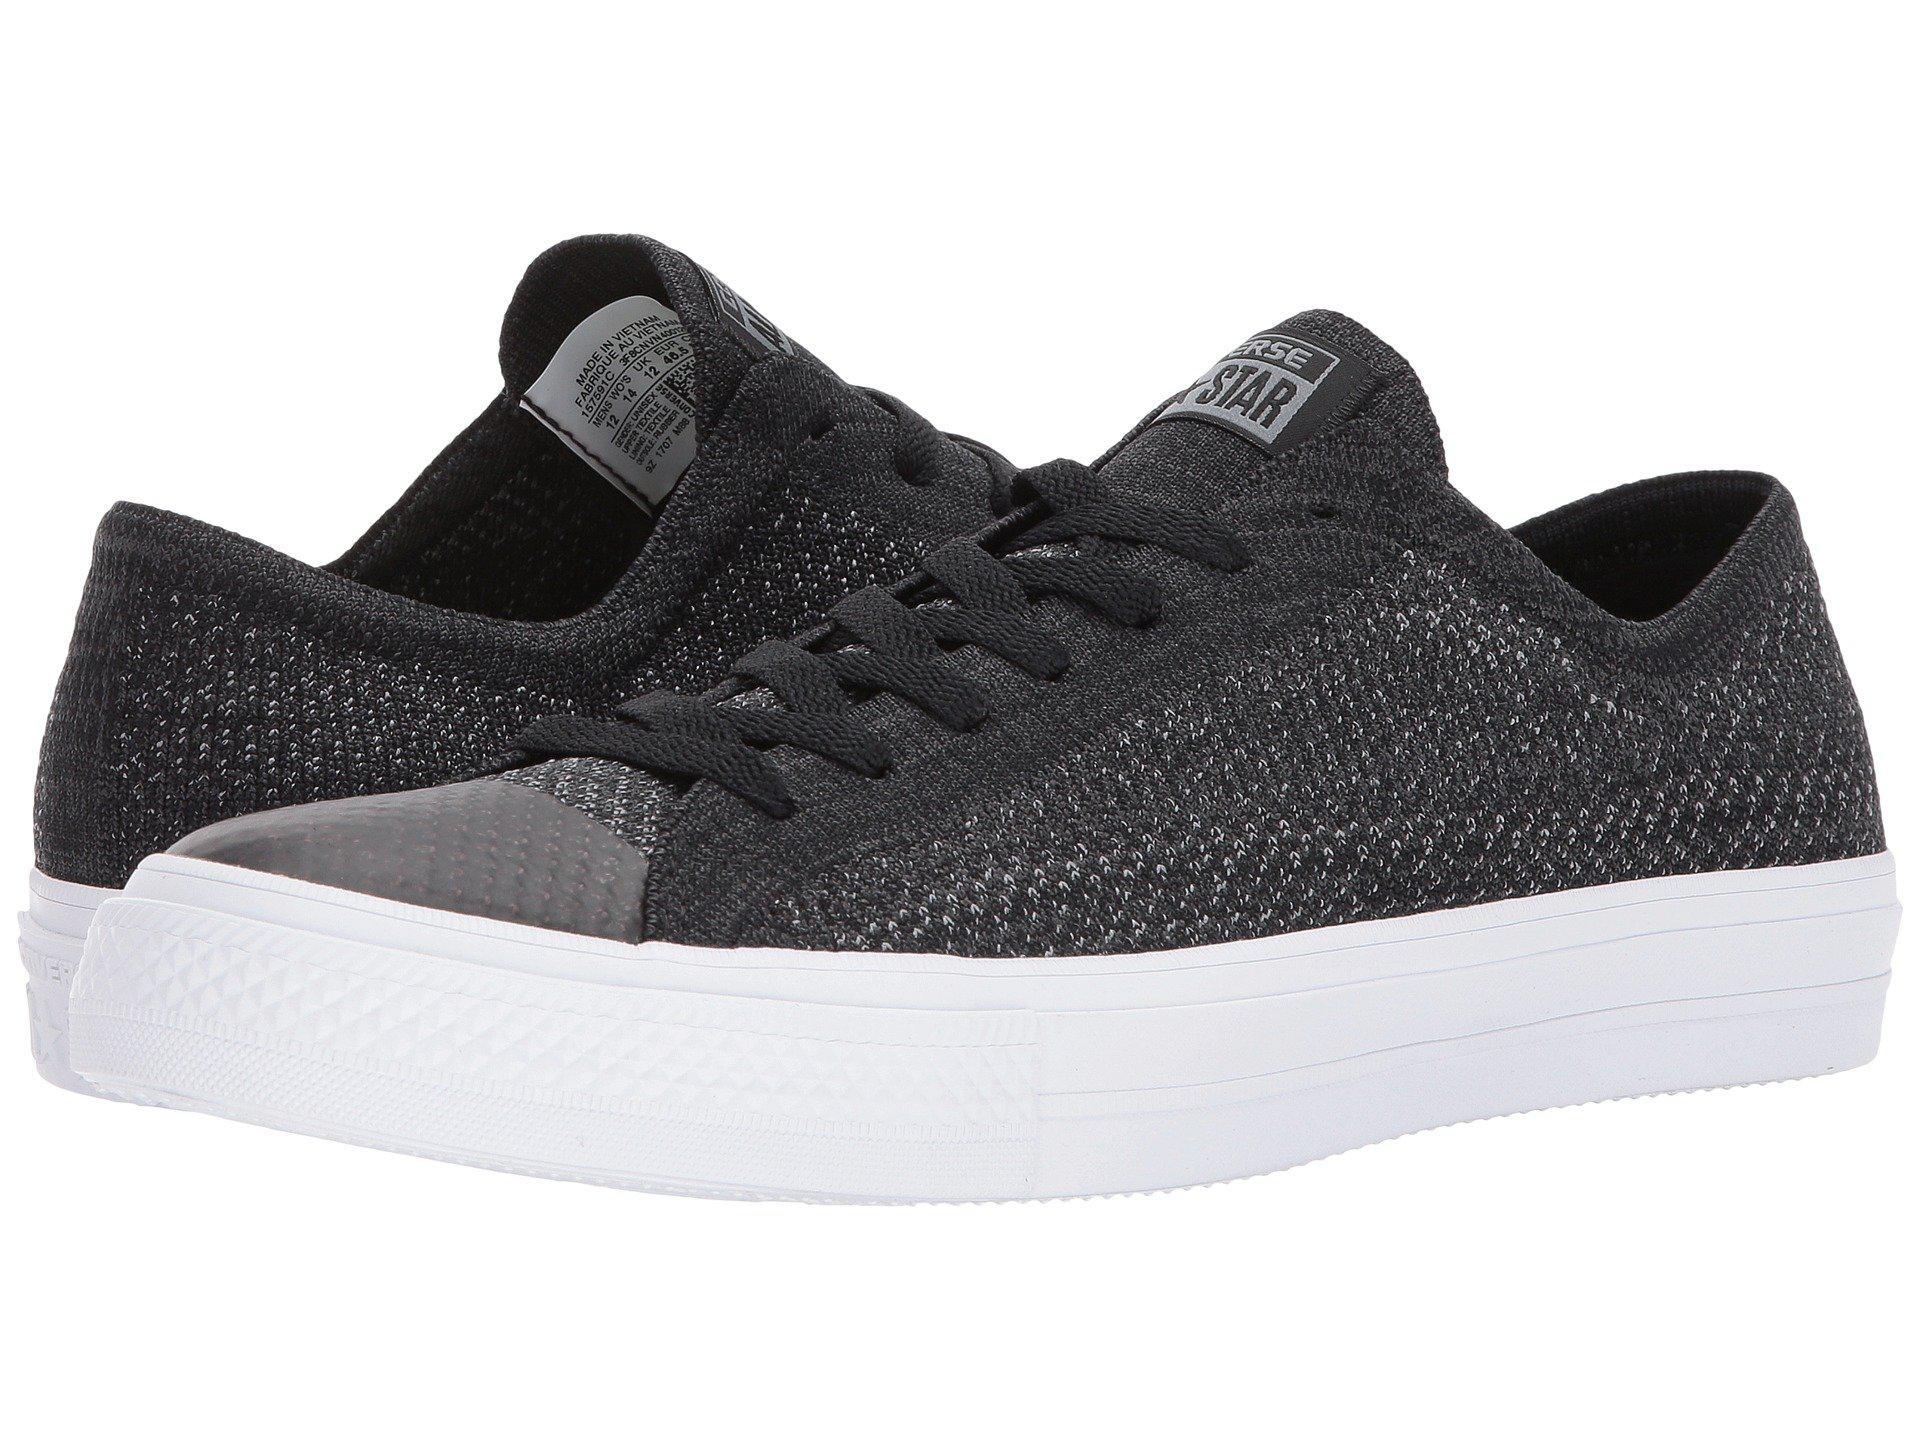 Lyst - Converse Chuck Taylor® All Star® X Nike Flyknit Ox in Black ... 8d4e9dac3